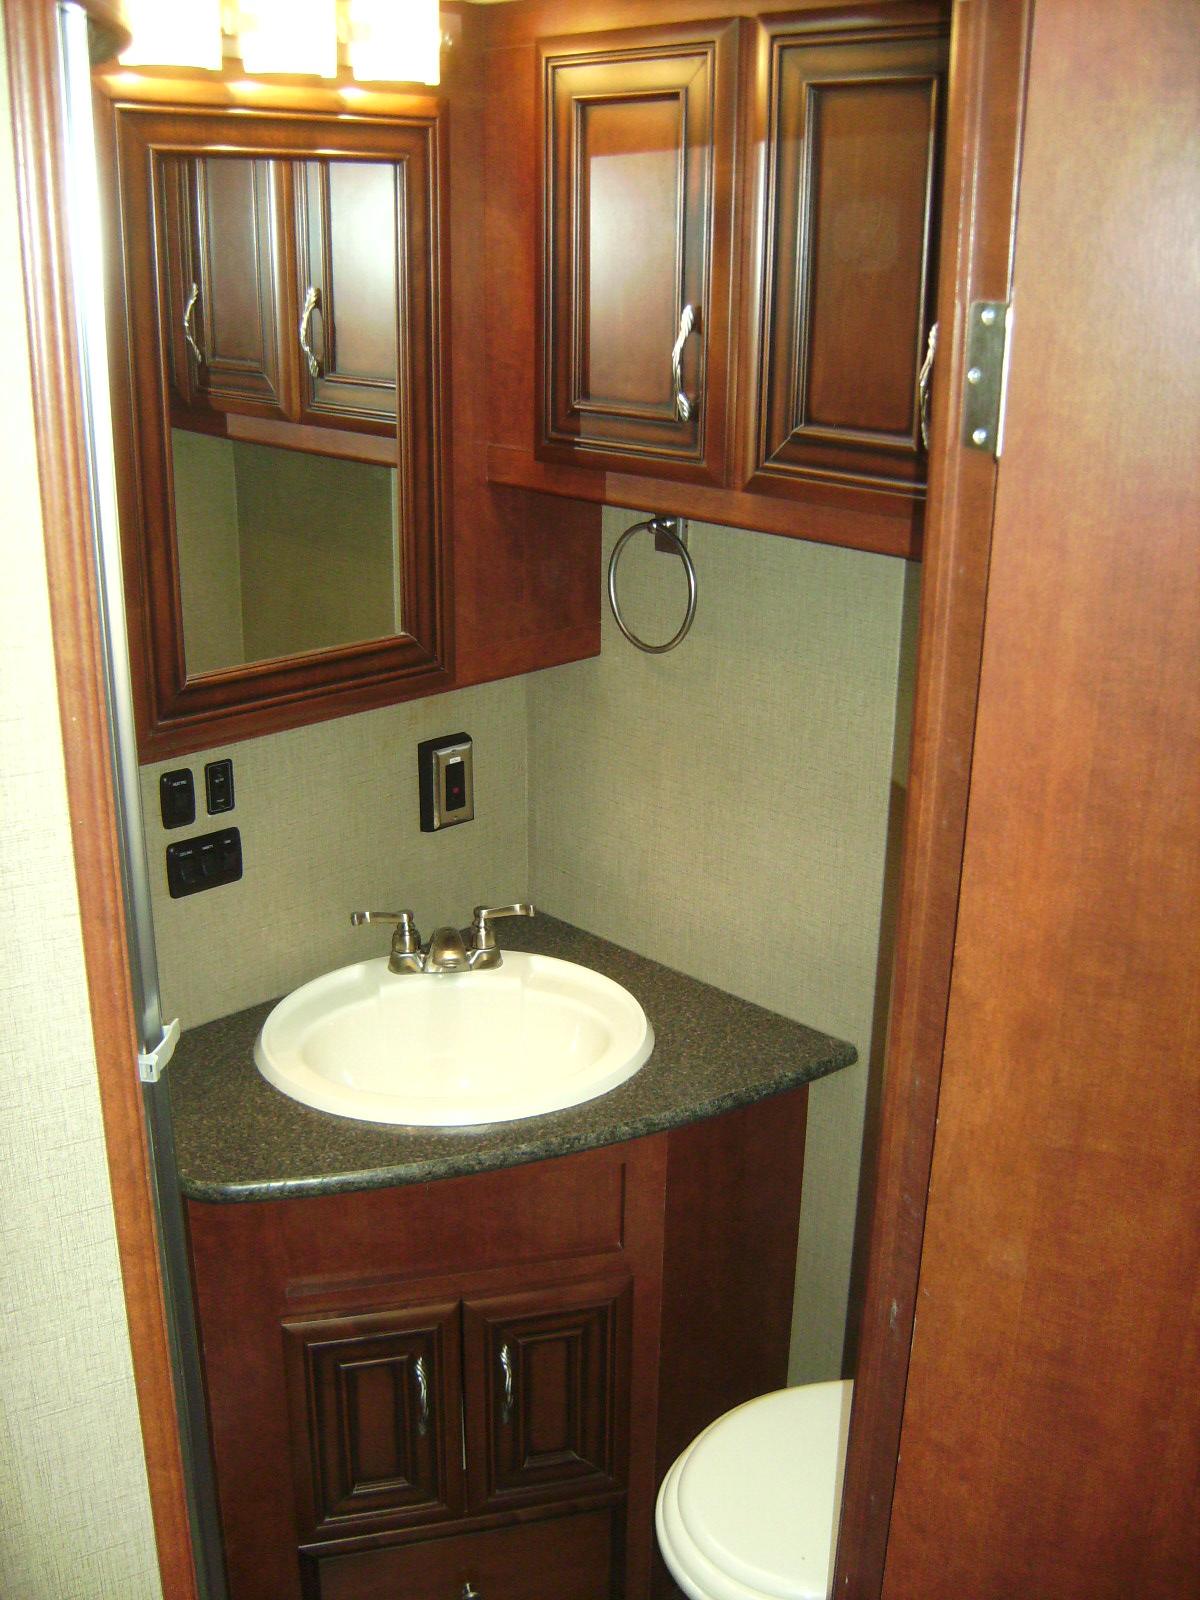 2014 newmar bay star 2903 fountain hills rv home. Black Bedroom Furniture Sets. Home Design Ideas